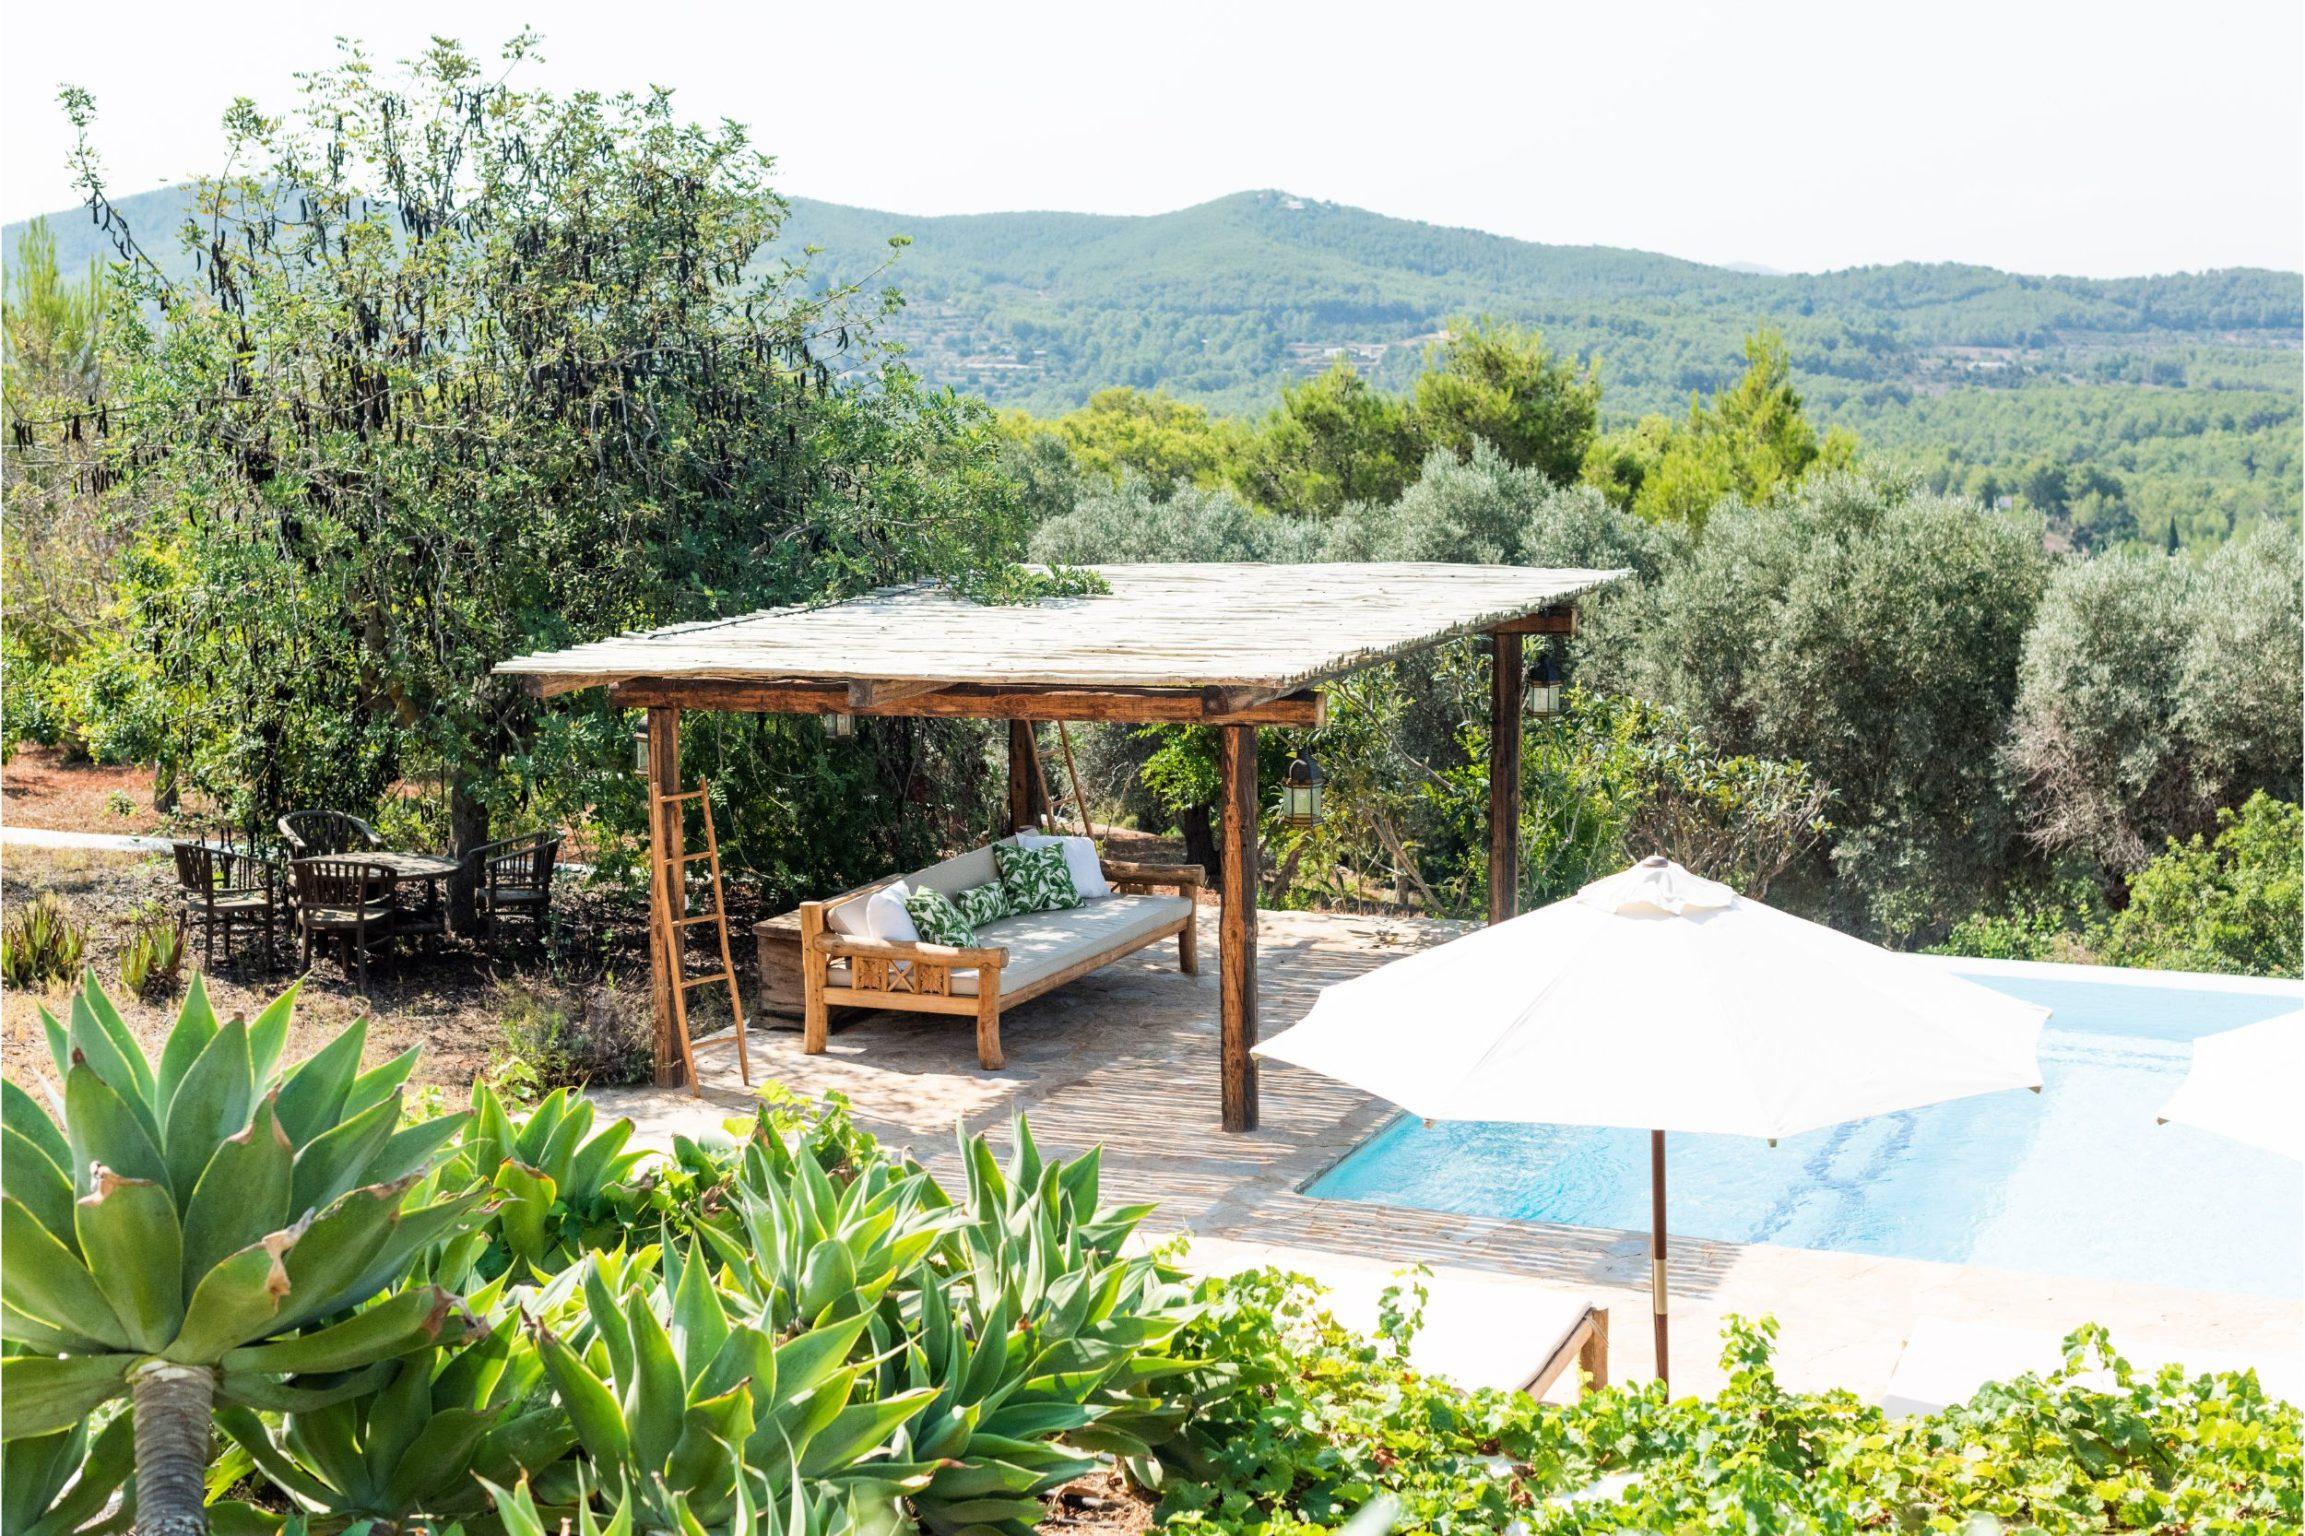 https://www.white-ibiza.com/wp-content/uploads/2020/02/white-ibiza-villas-can-lavanda-outdoors-2-2305x1536.jpg